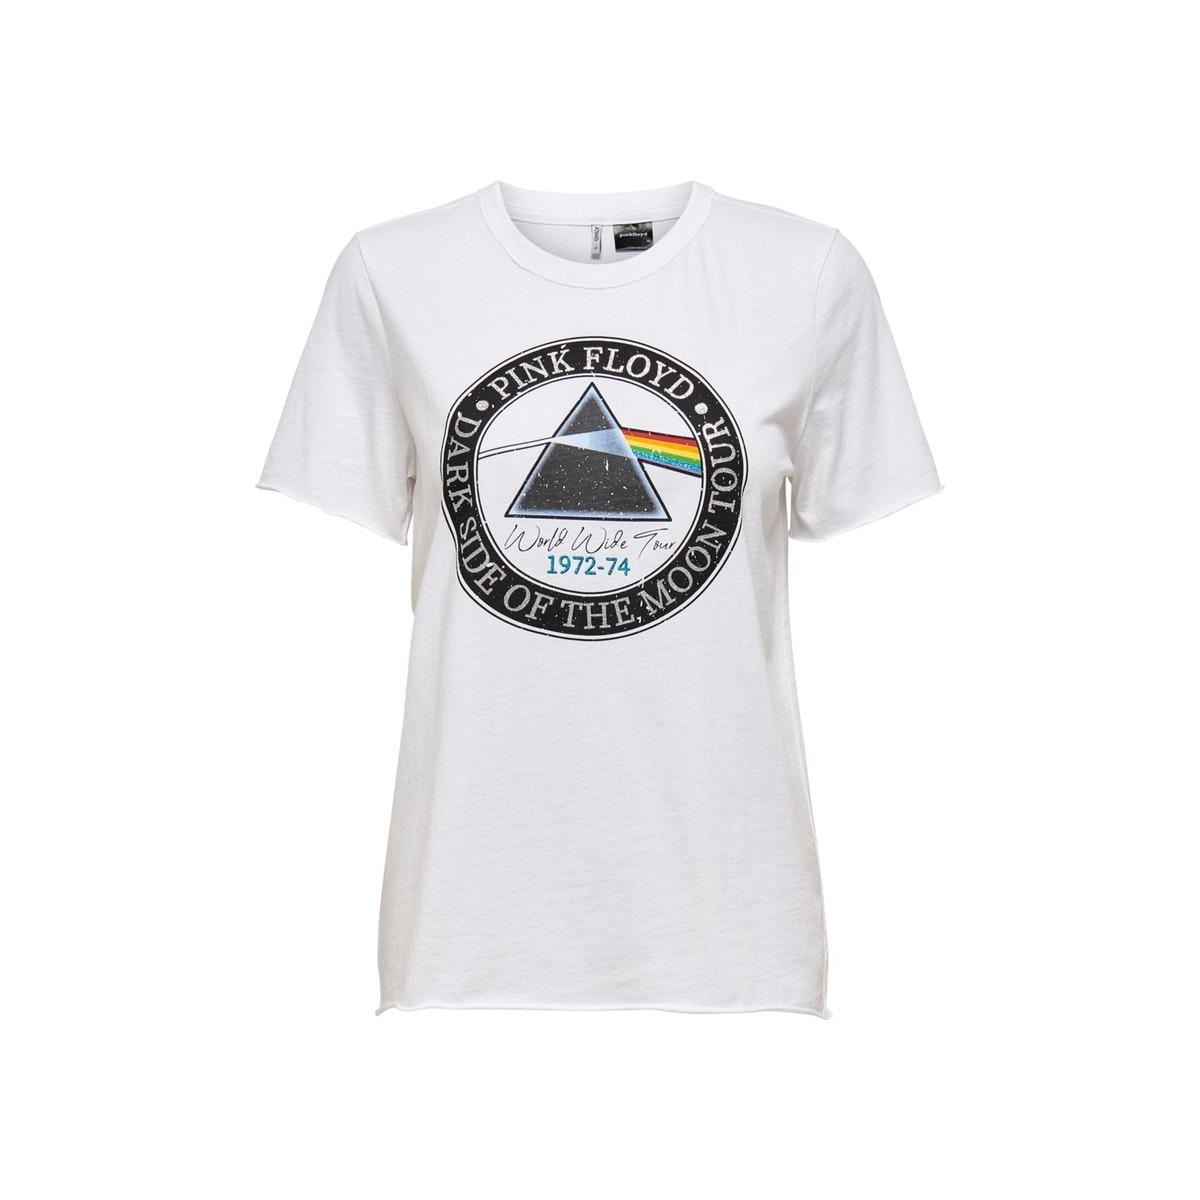 onlpink floyd life reg s/s top box 15206458 only t-shirt bright white/dark side